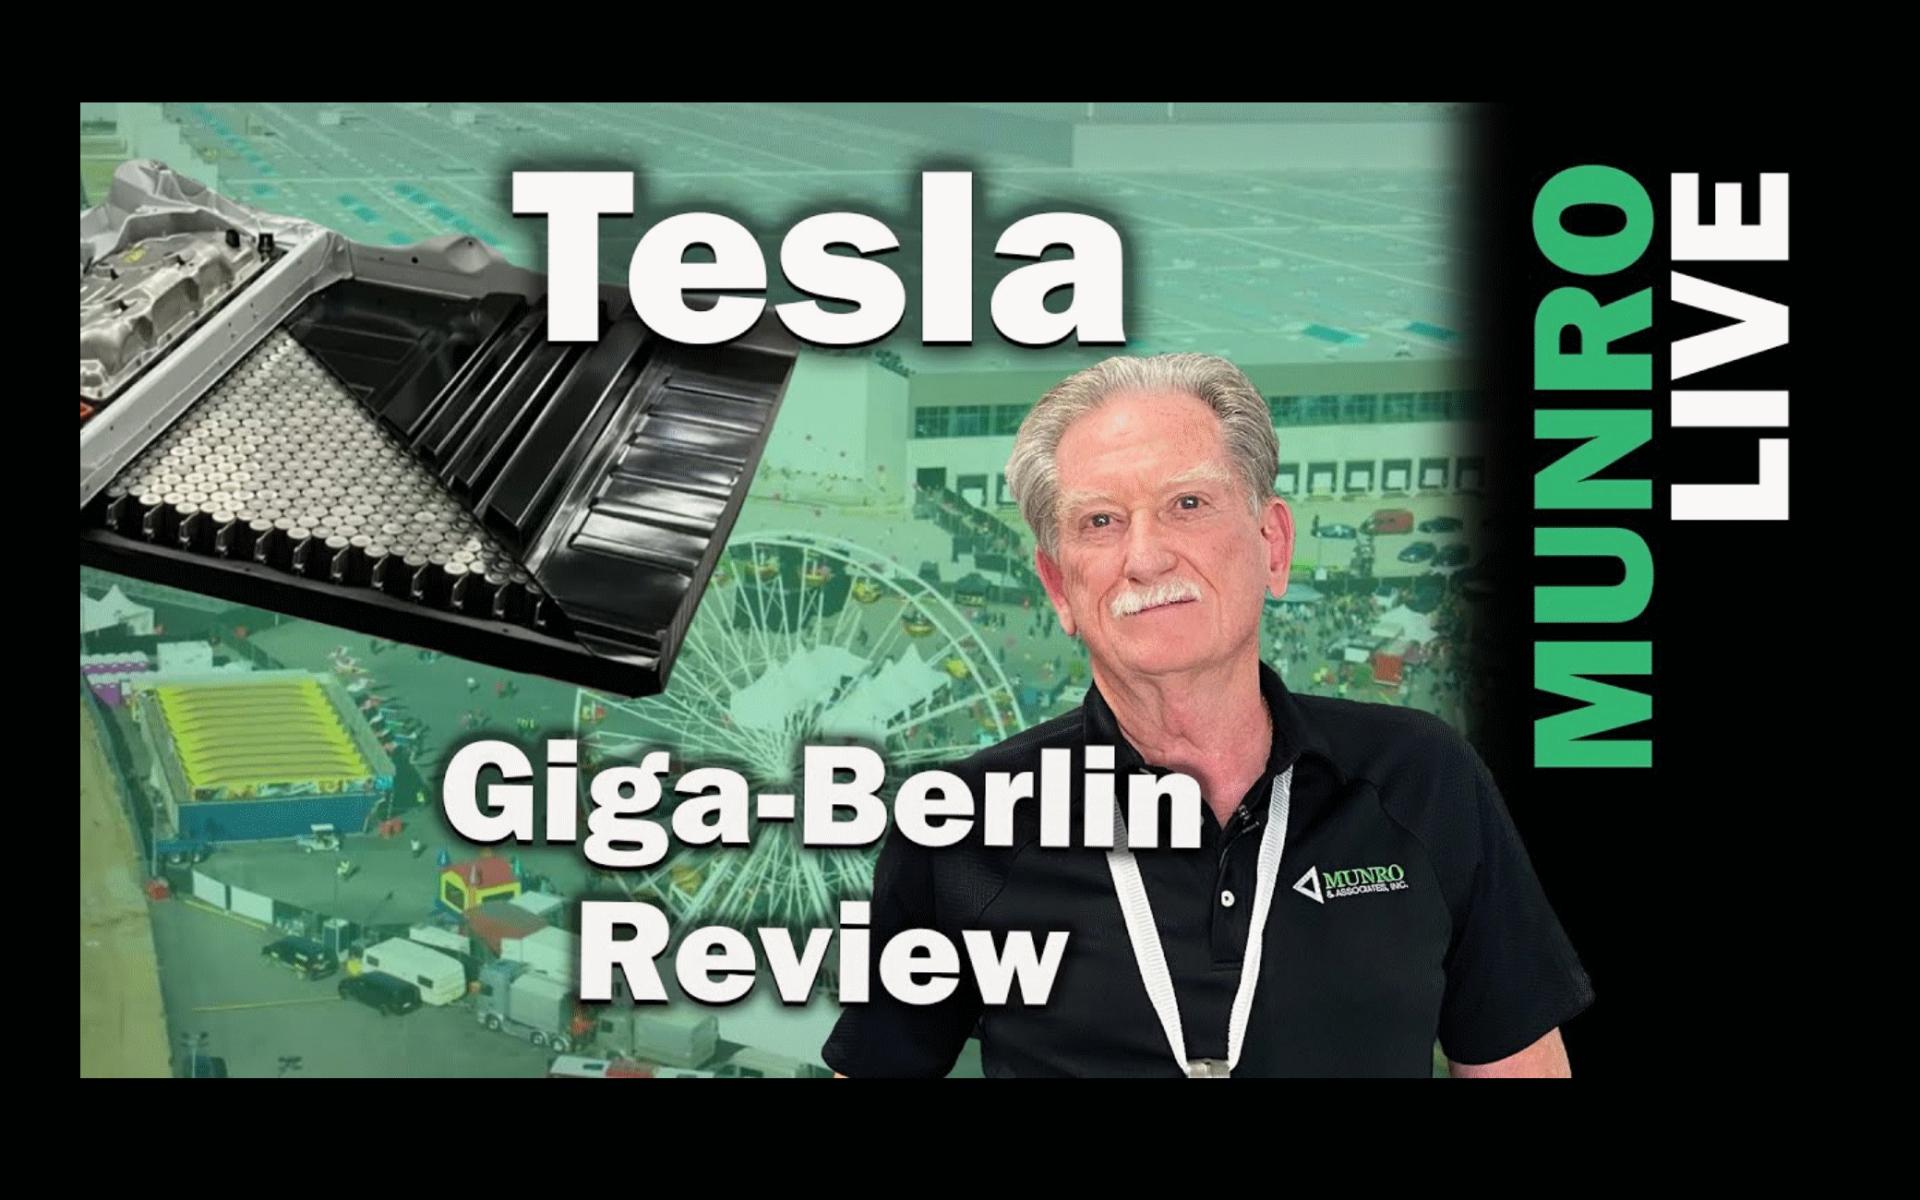 Tesla Giga Berlin Review Sandy Munro